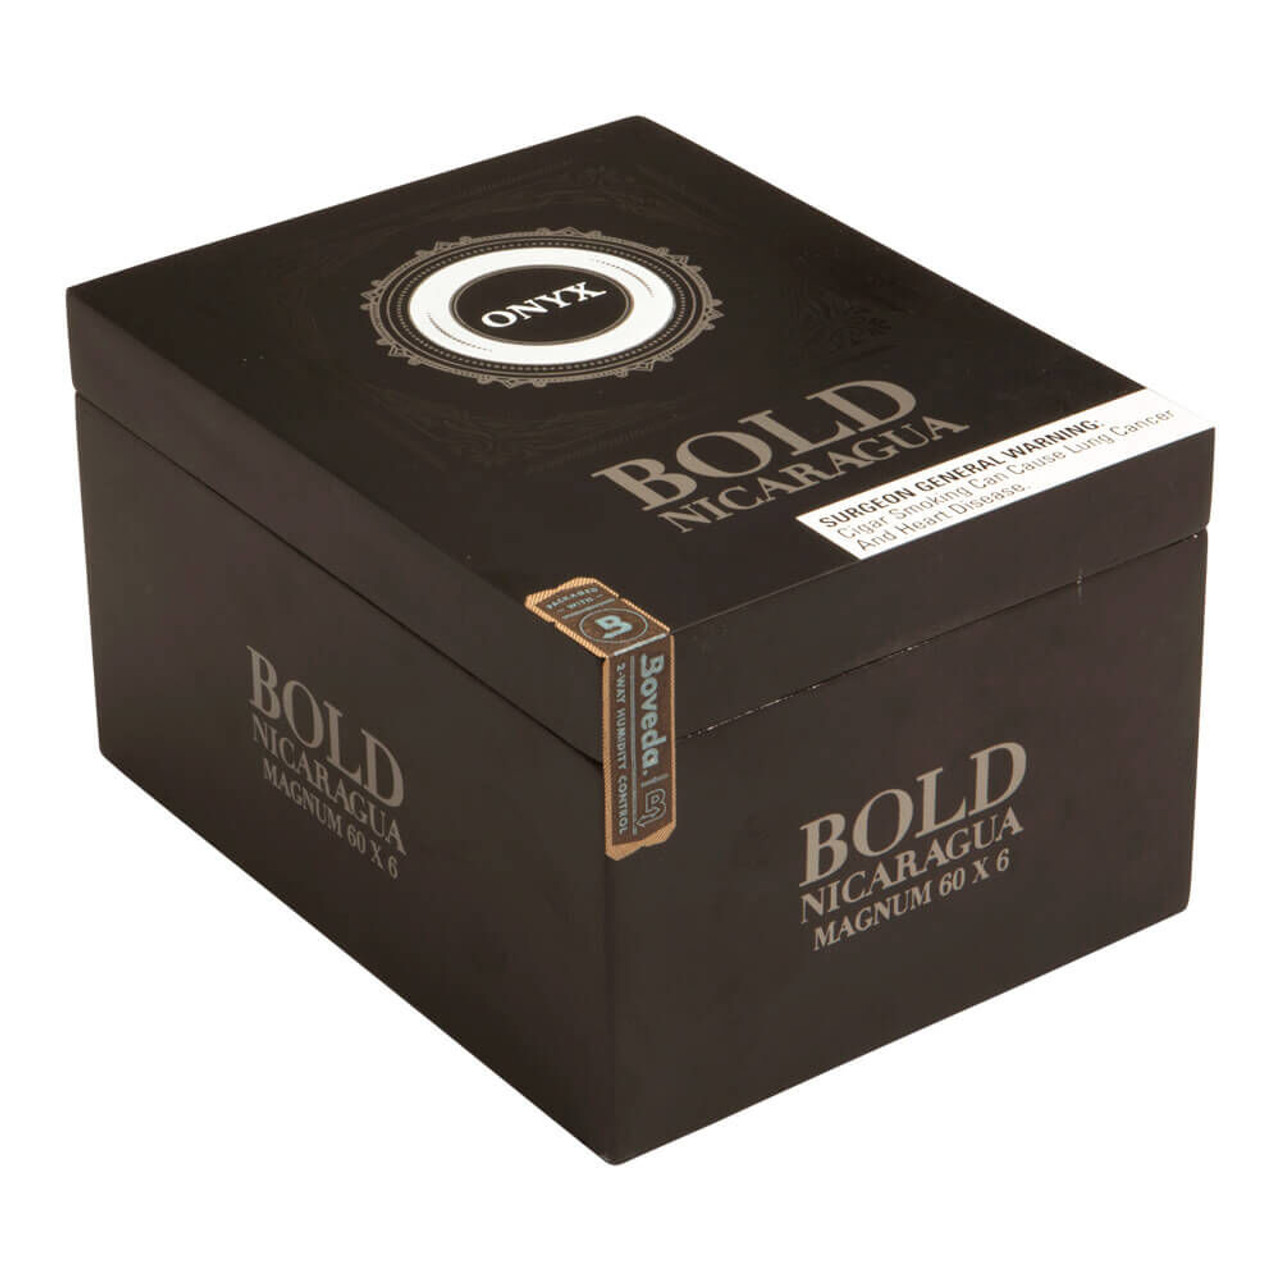 Onyx Bold Nicaragua Magnum Cigars - 6 x 60 (Box of 20)